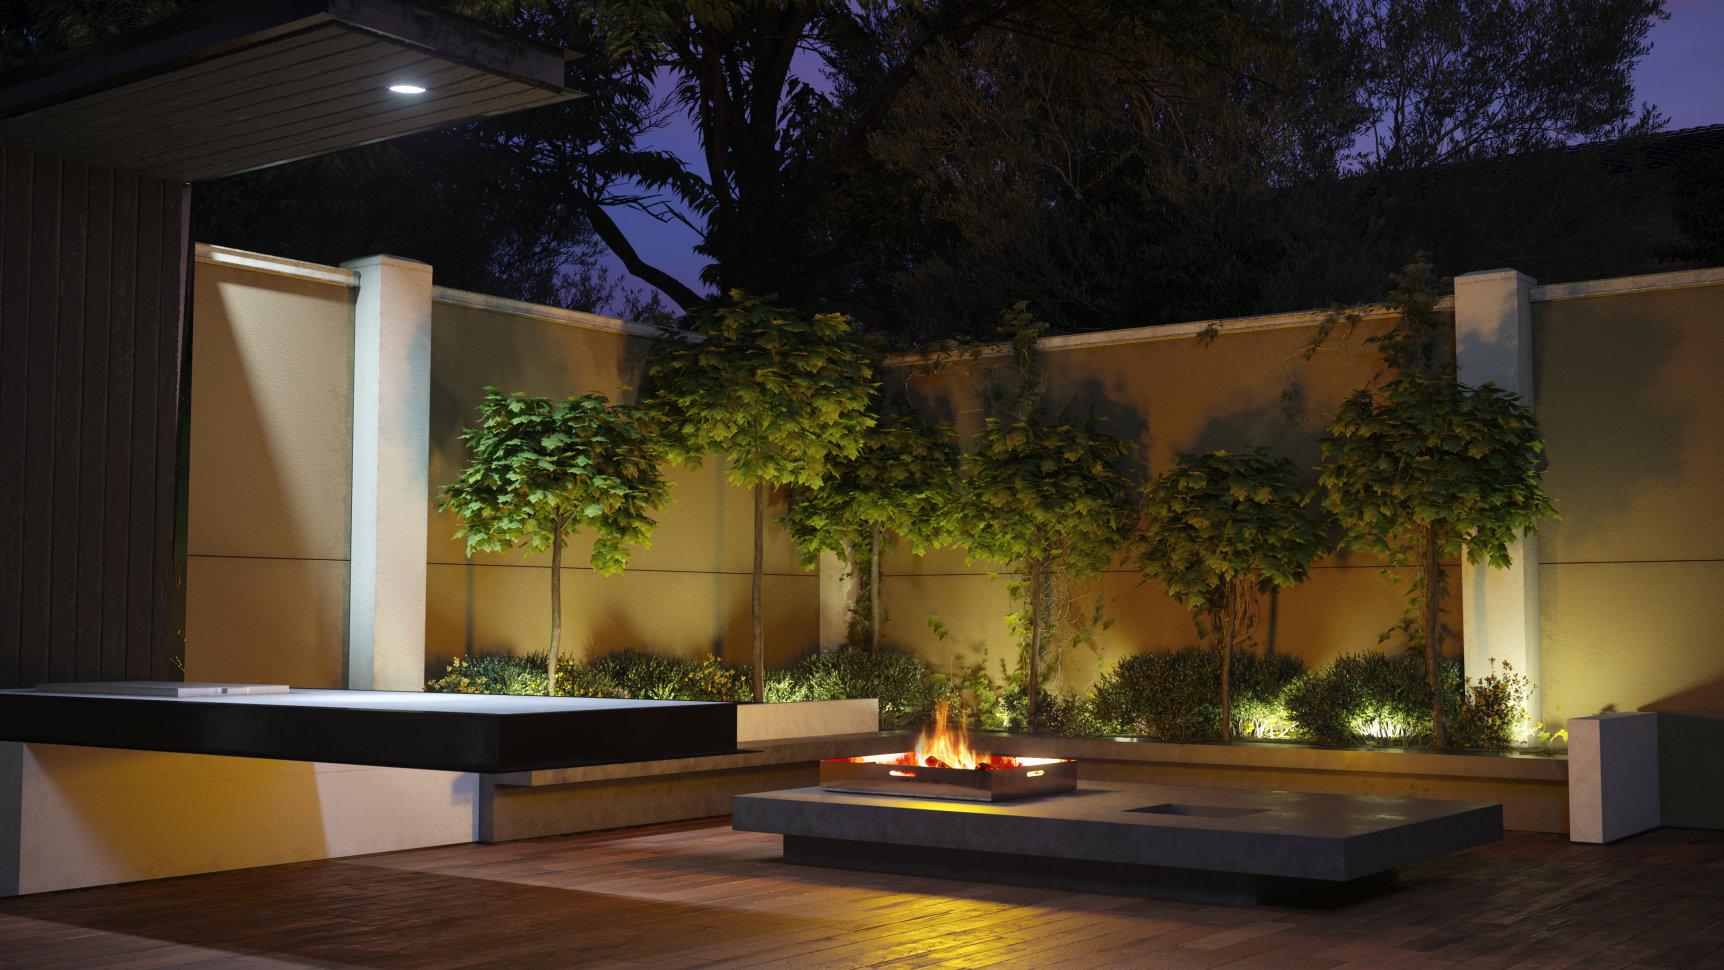 Wallmark modular walls in outdoor setting